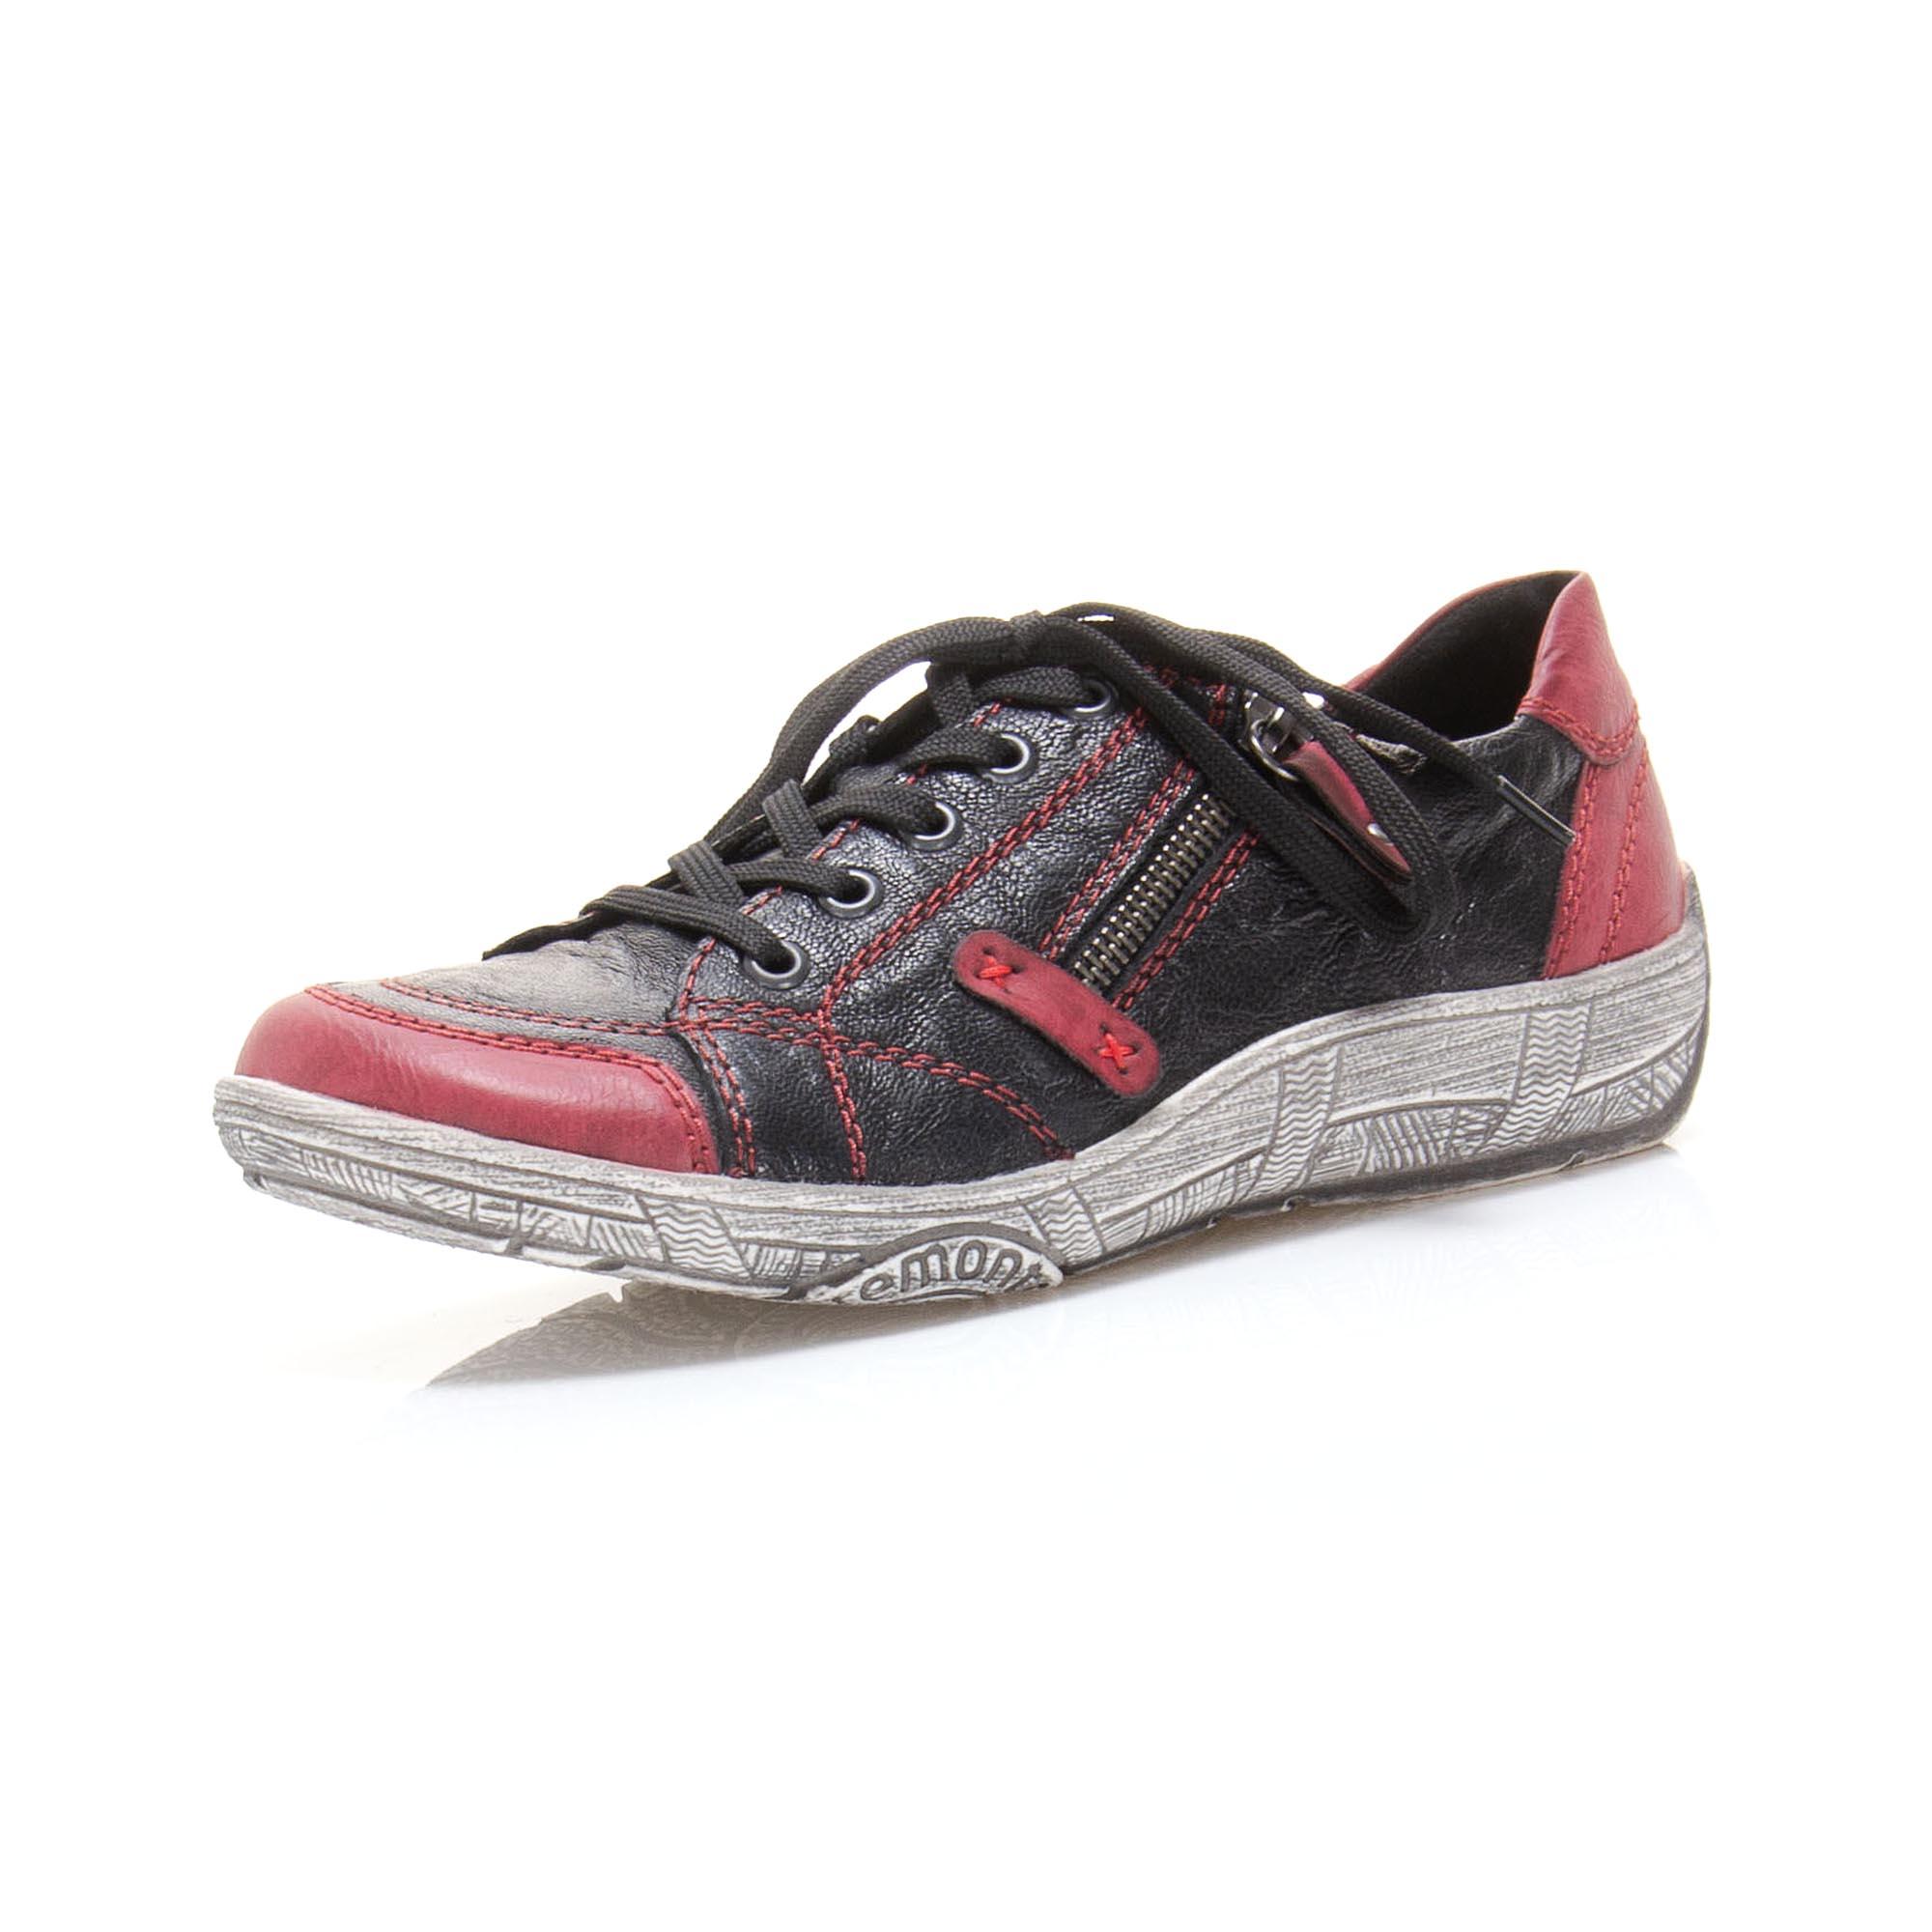 1a9d3c568284 detail Dámská obuv RIEKER - REMONTE br D3808-01 SCHWARZ KOMBI F